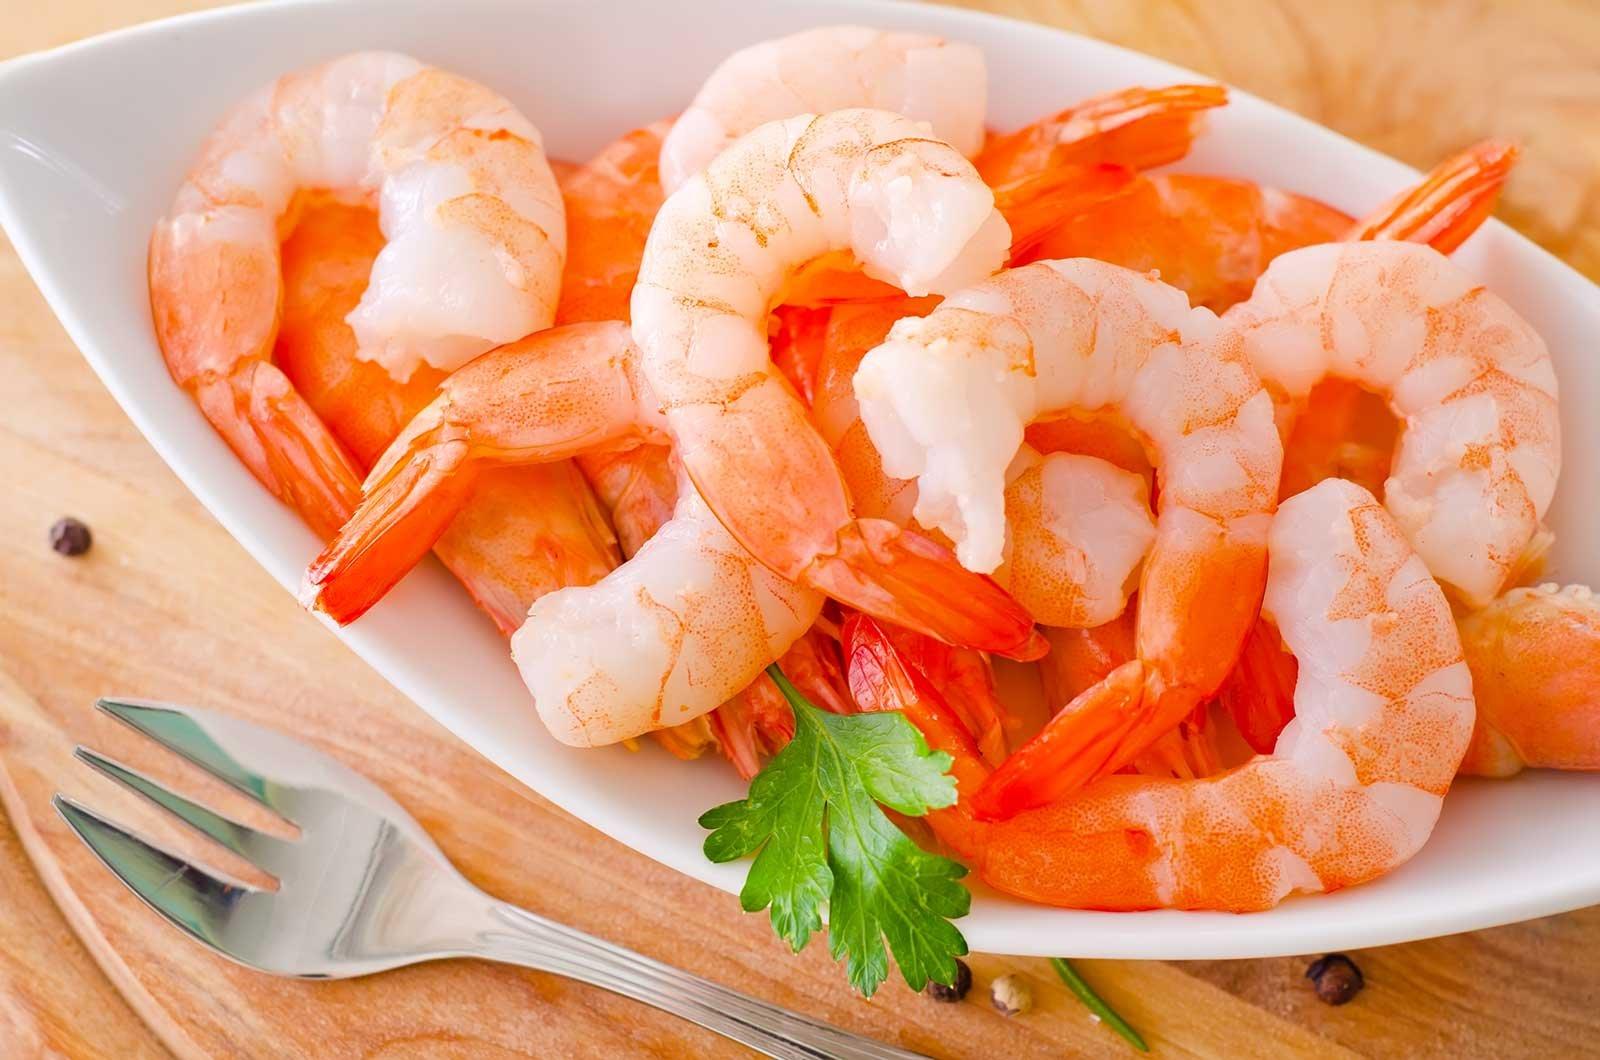 Golden Phoenix seared shrimps.